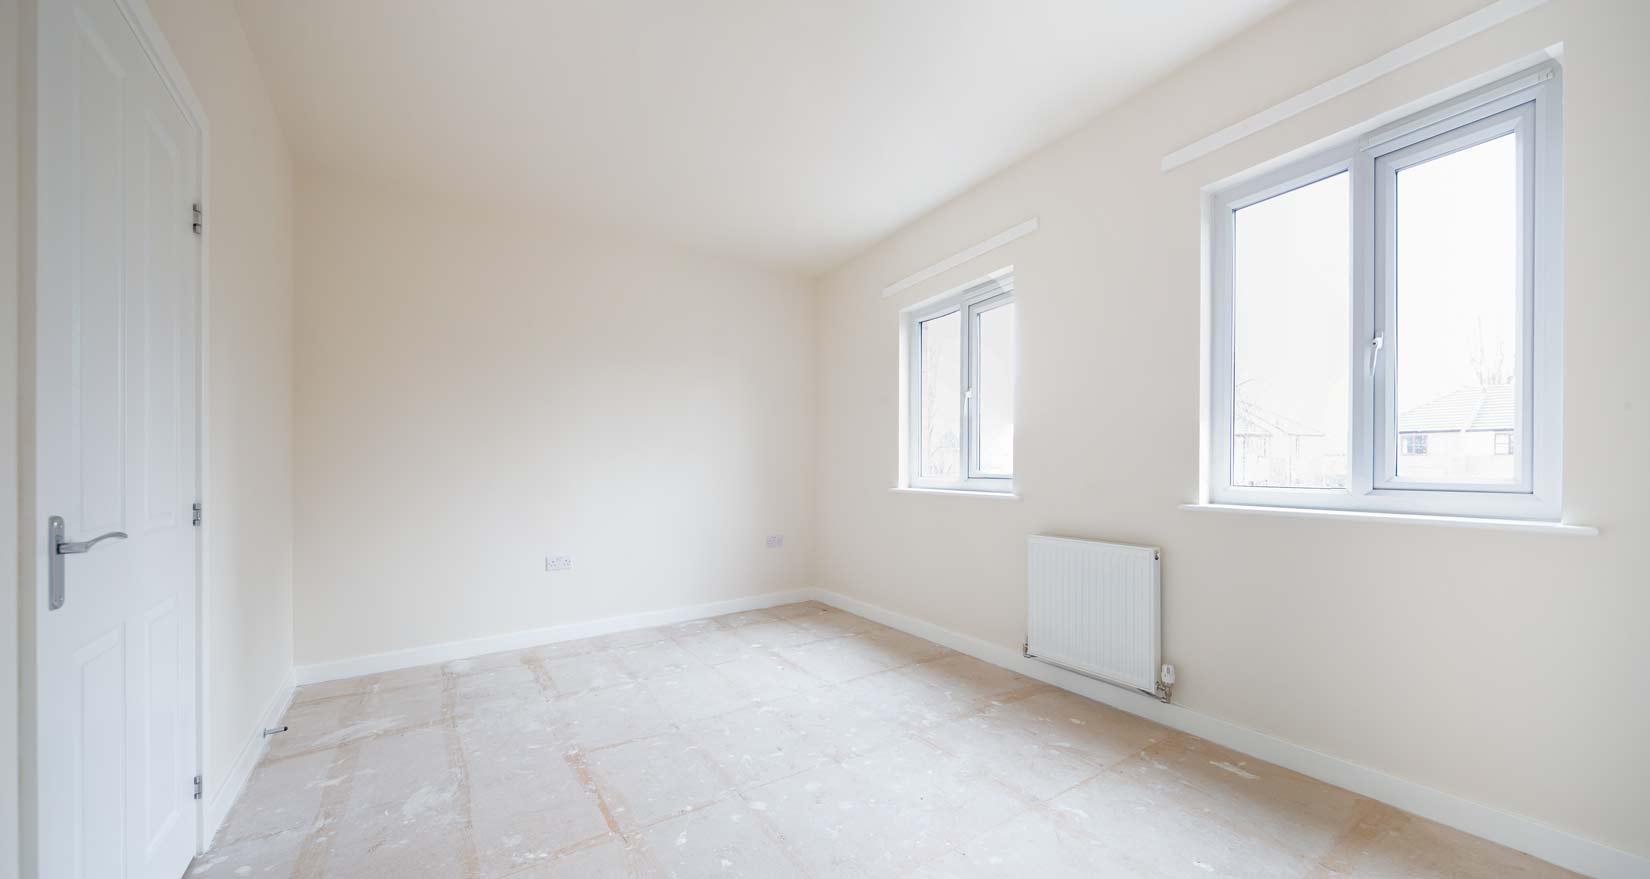 bedroom-interior-new-development-unfurnished